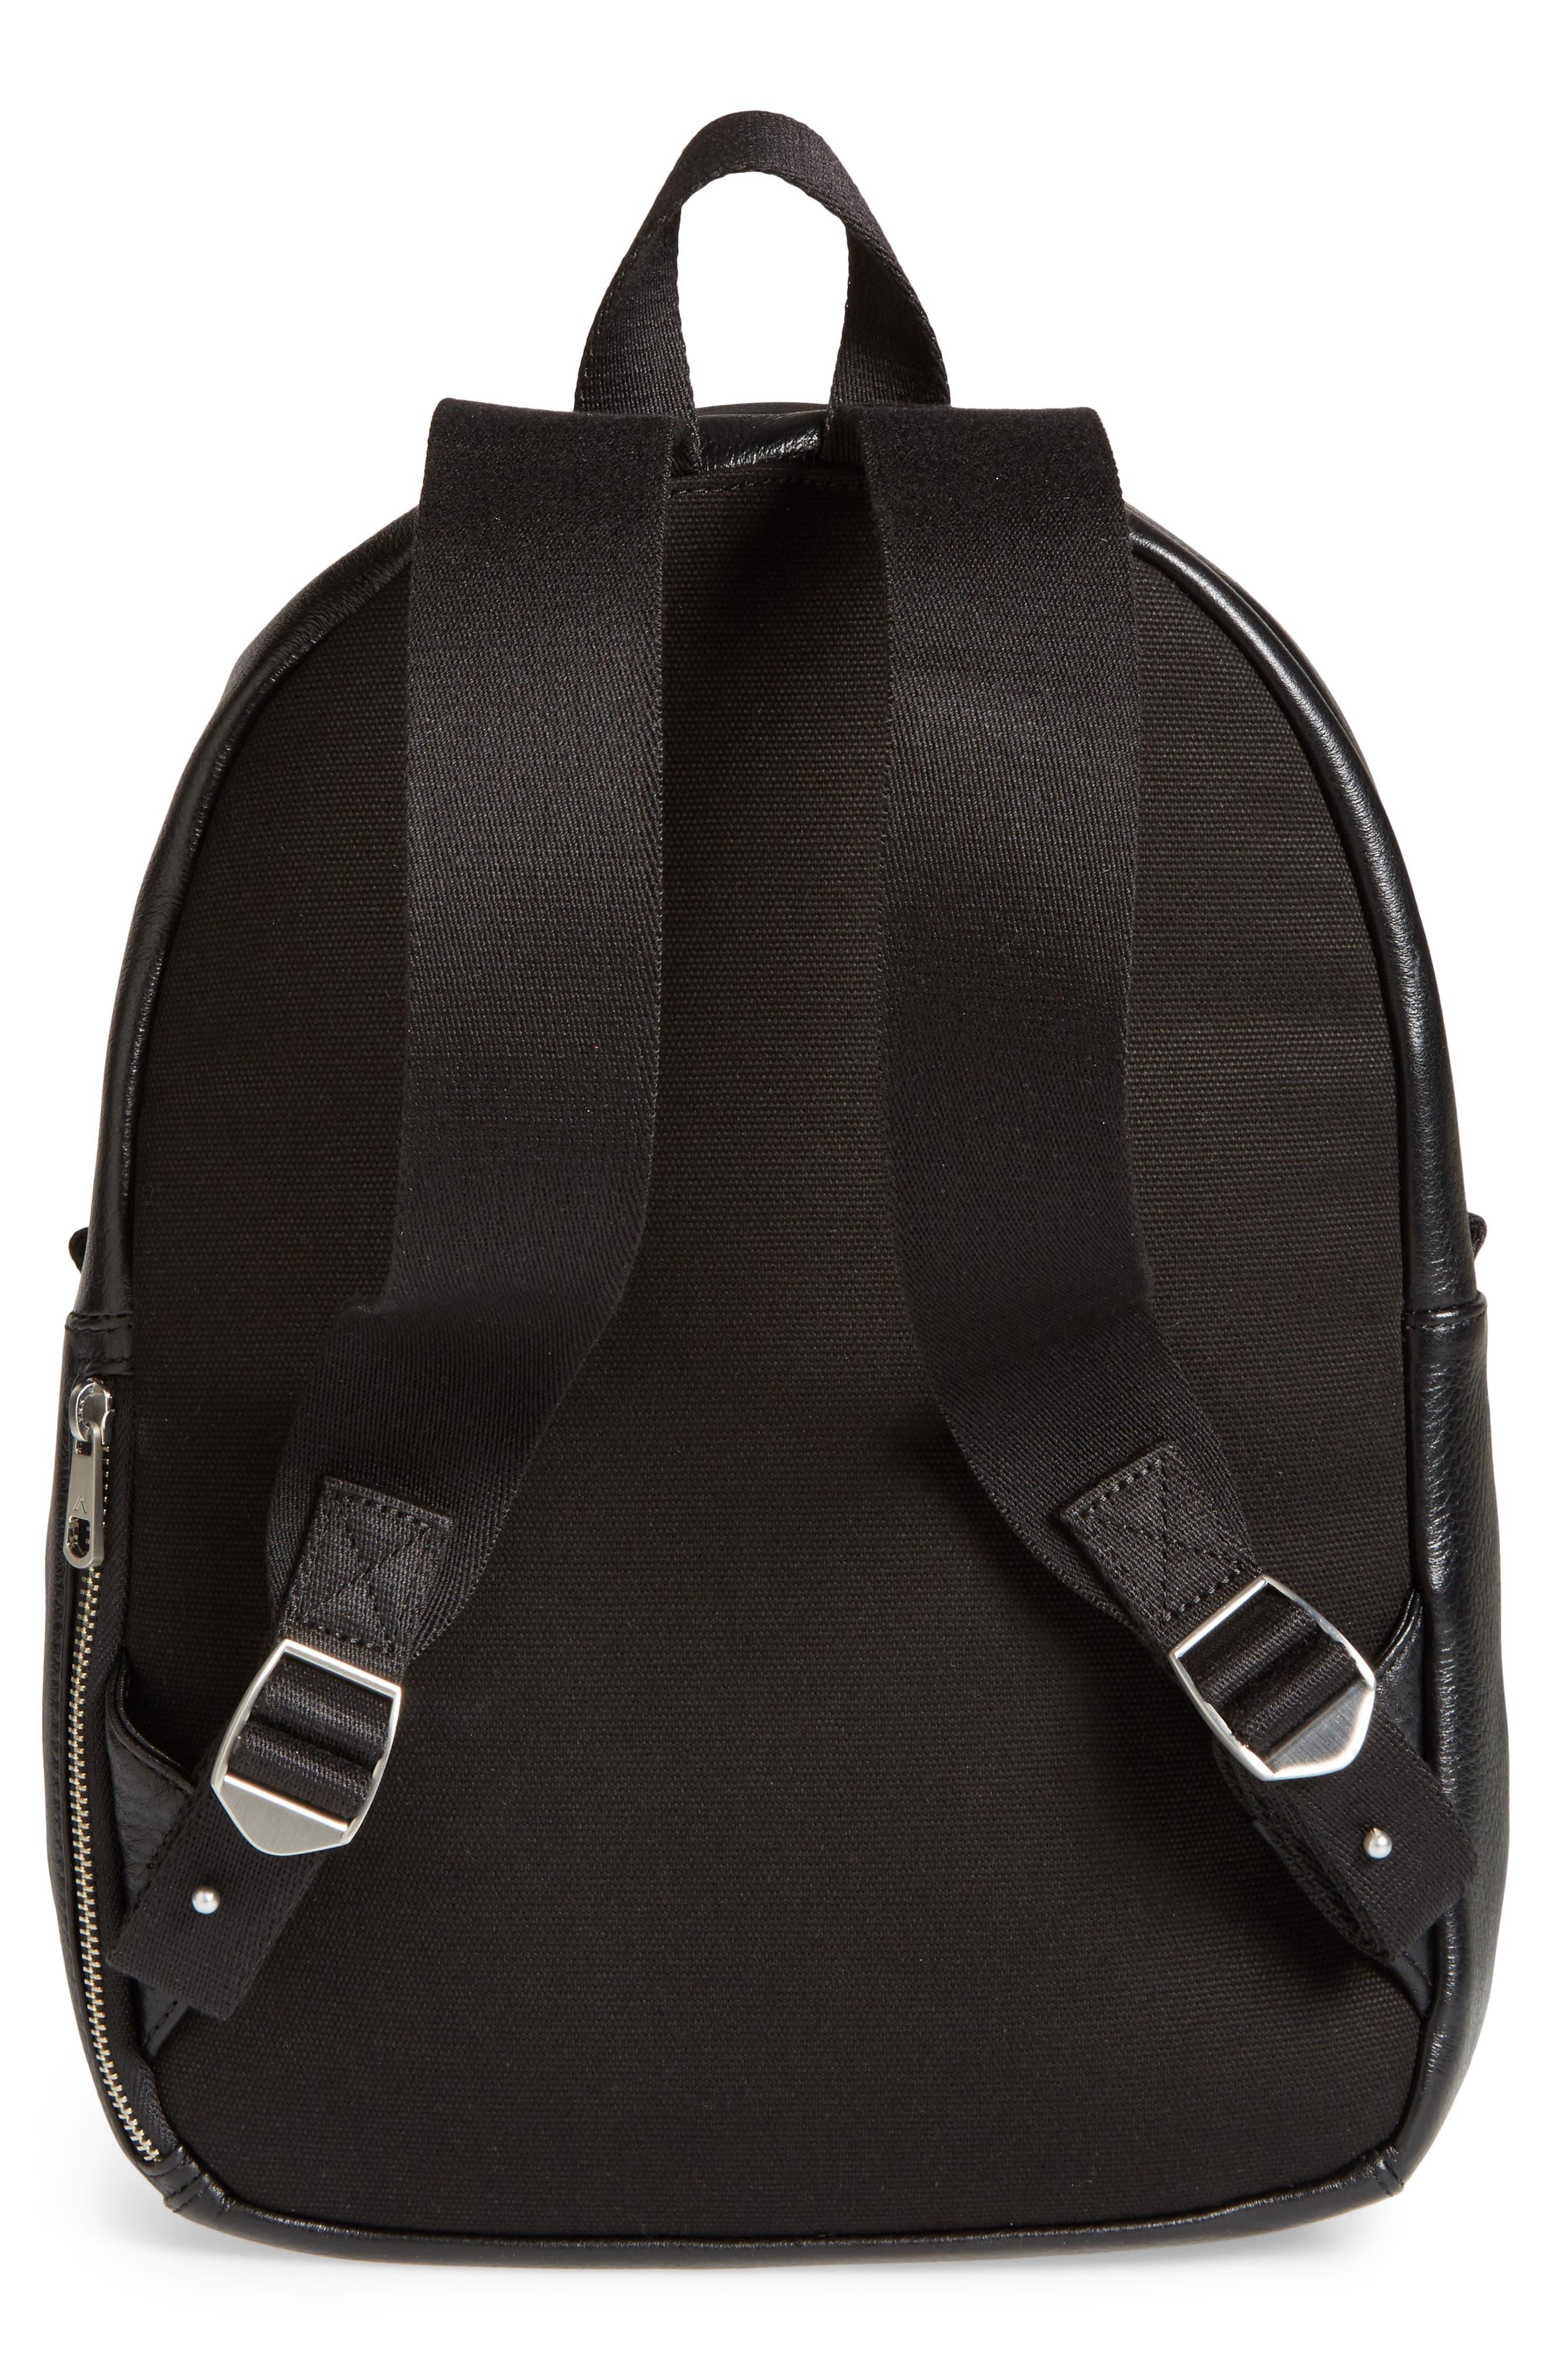 Alternate Image 3  - STATE Bags Greenwood Mini Lorimer Leather Backpack